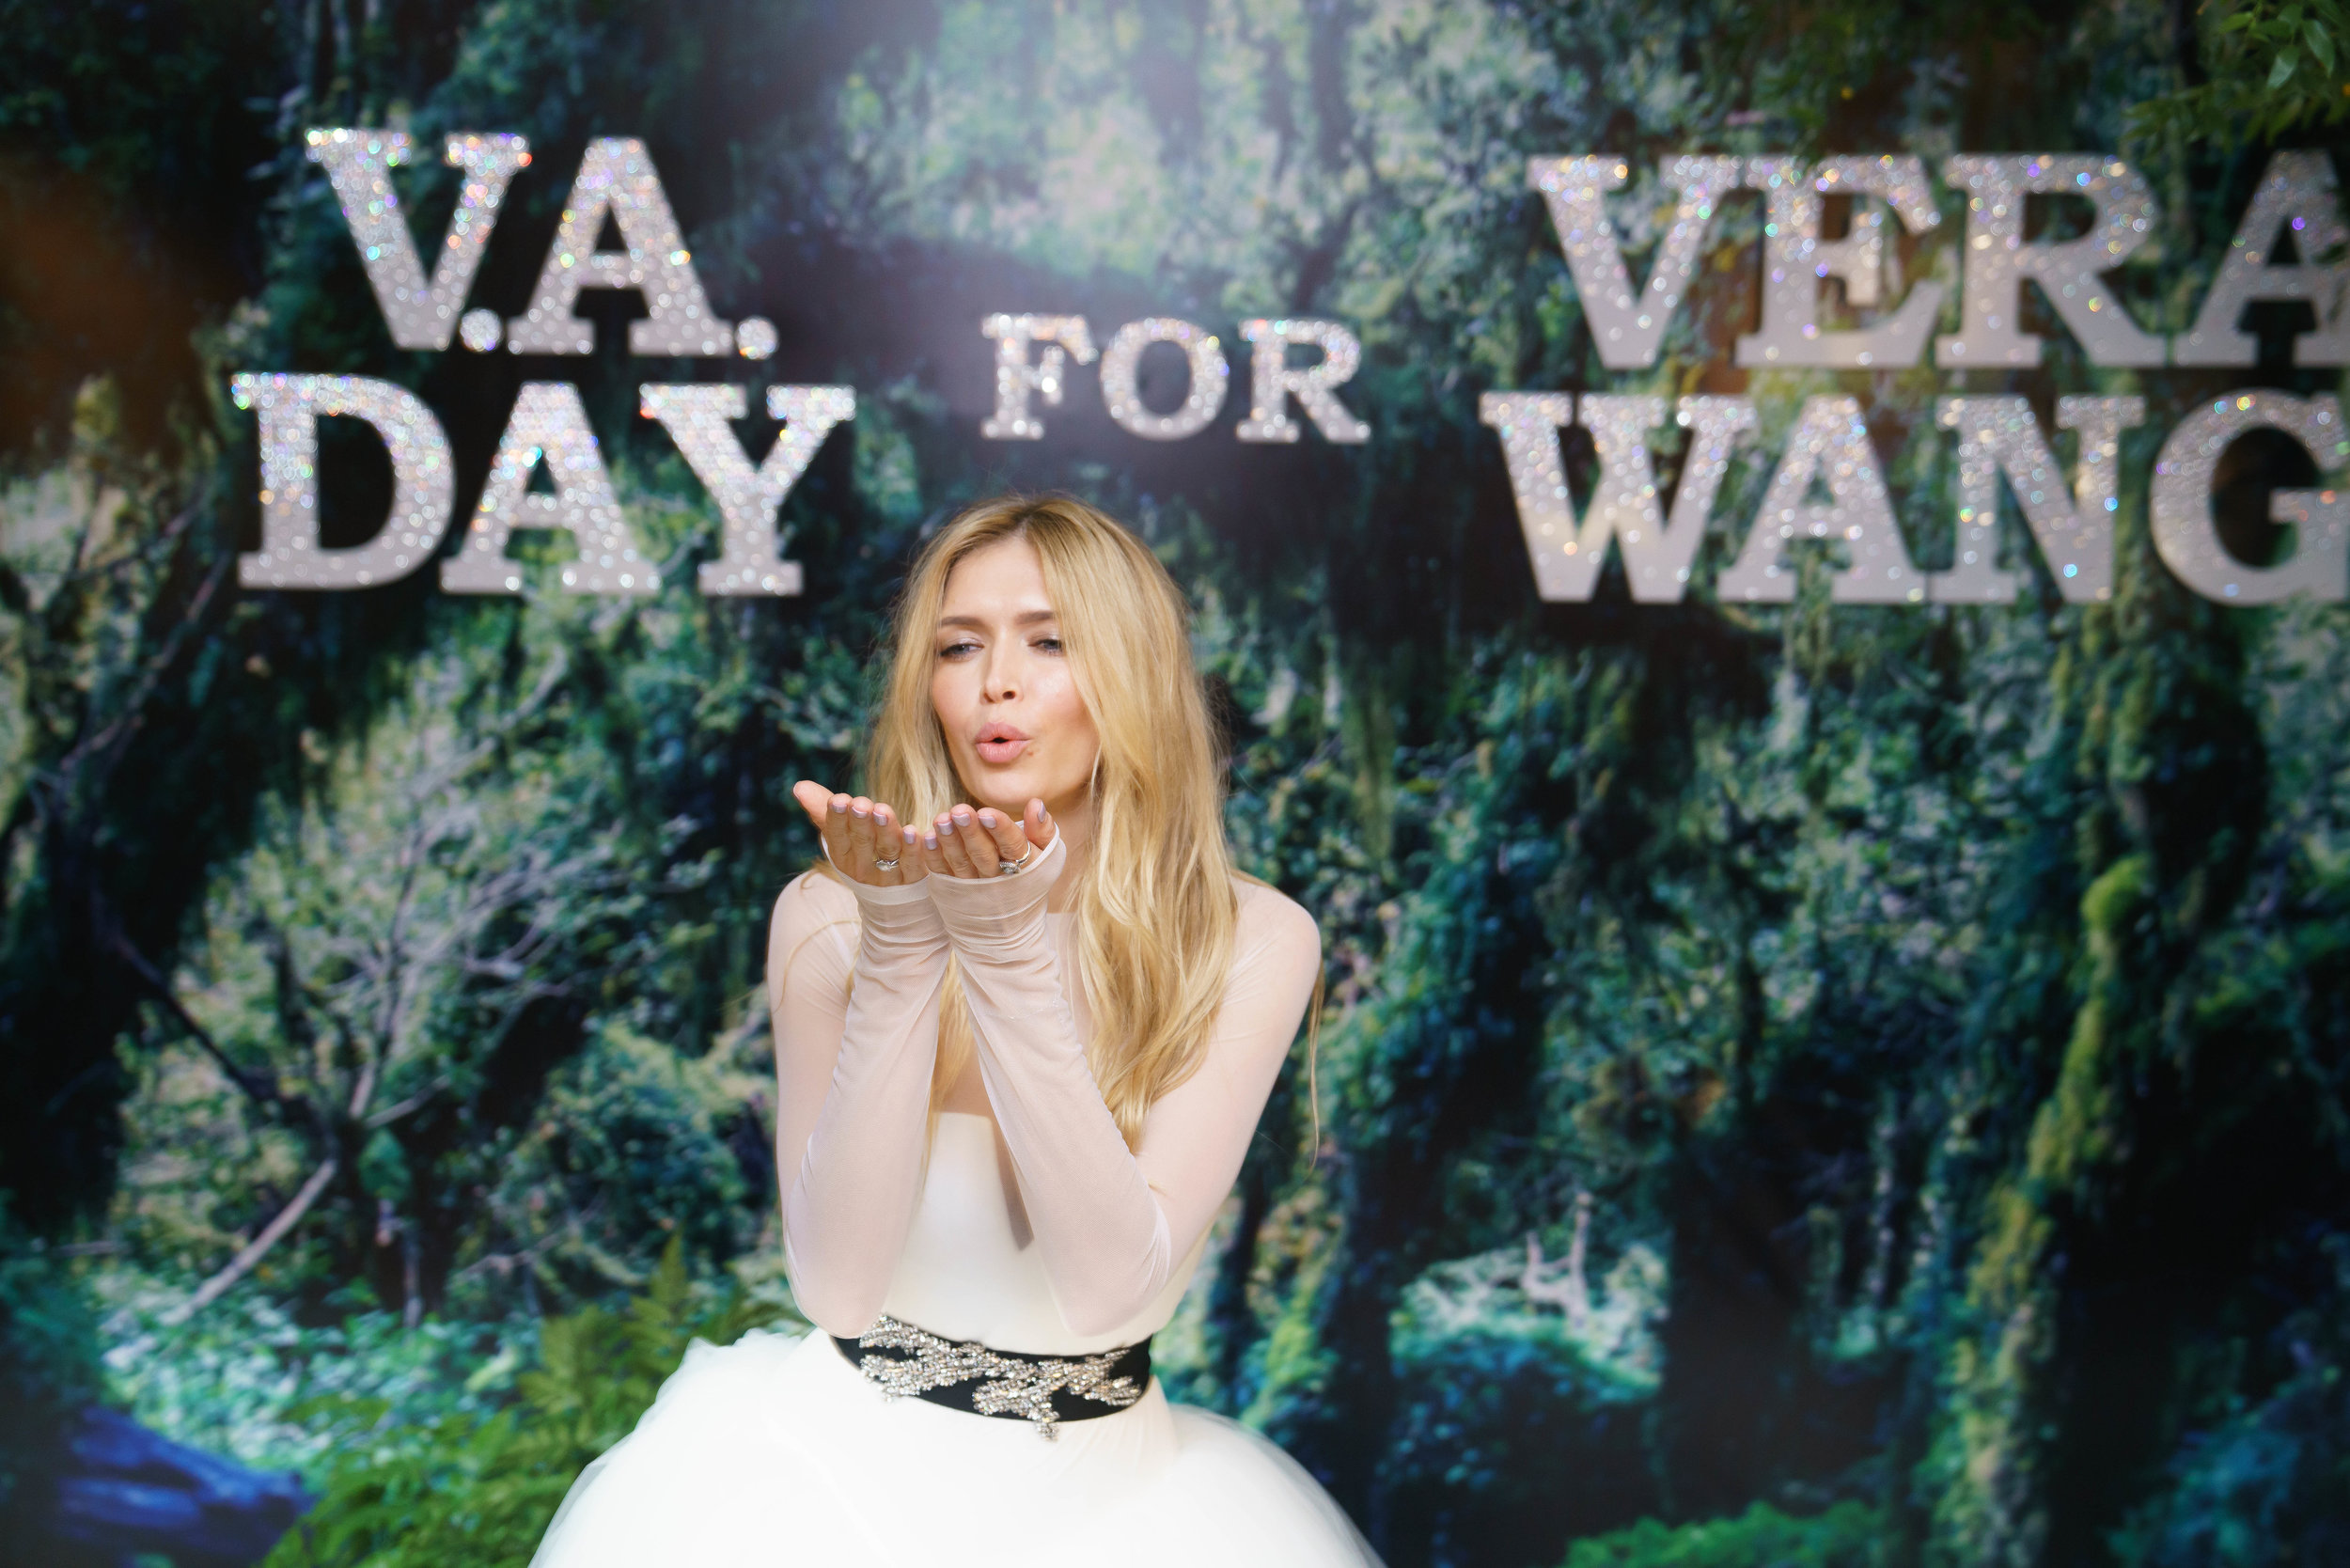 Vera Wang by VA Day photo roman-ivanov.com5.jpg